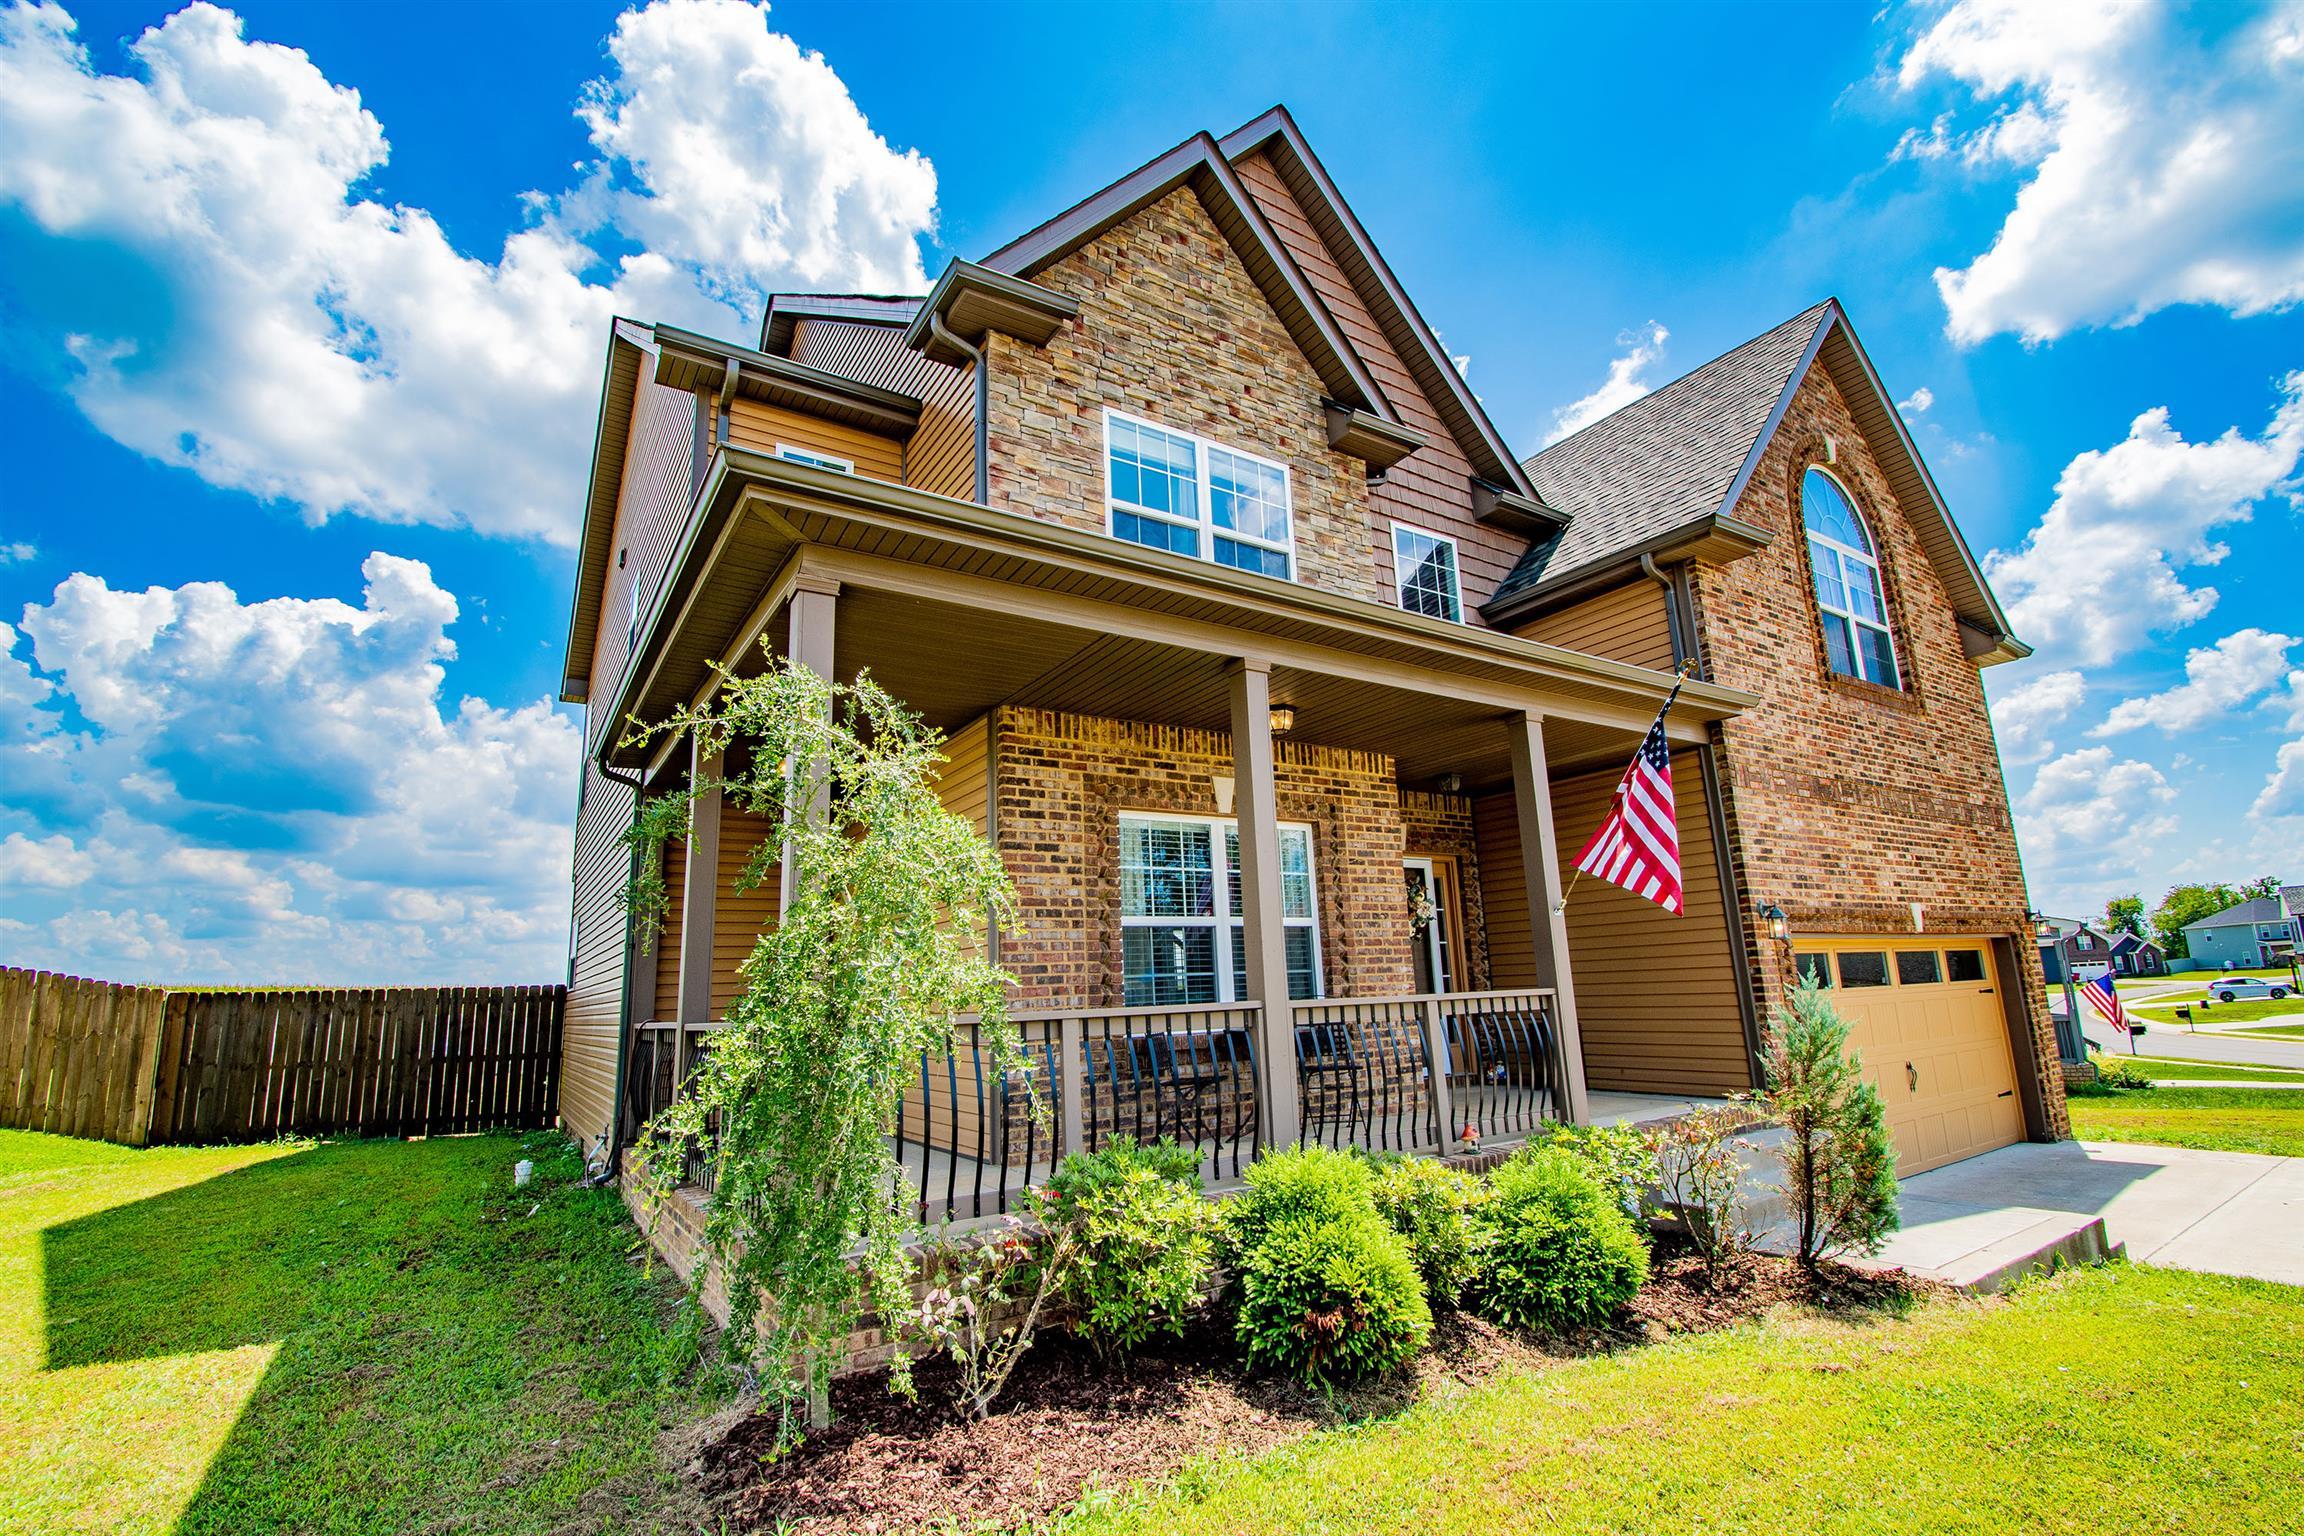 2392 Andersonville Dr, Clarksville, TN 37042 - Clarksville, TN real estate listing